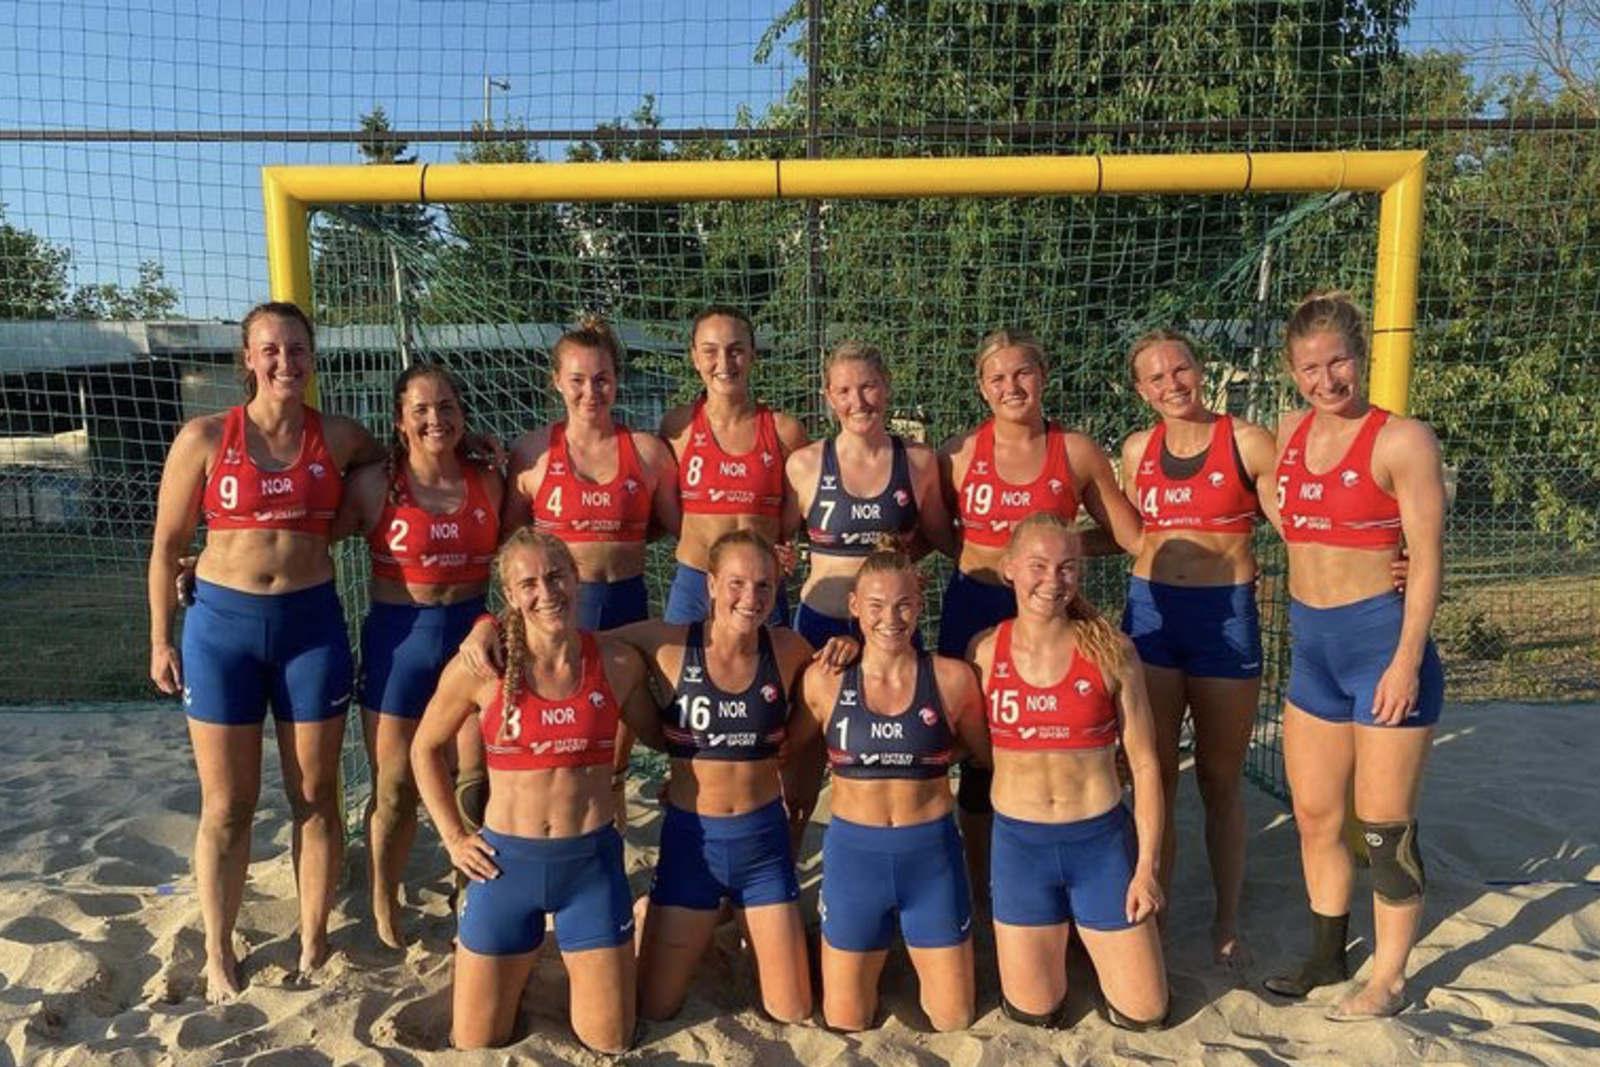 Norway's beach handball team pictured wearing shorts instead of bikini bottoms at a European championship match.